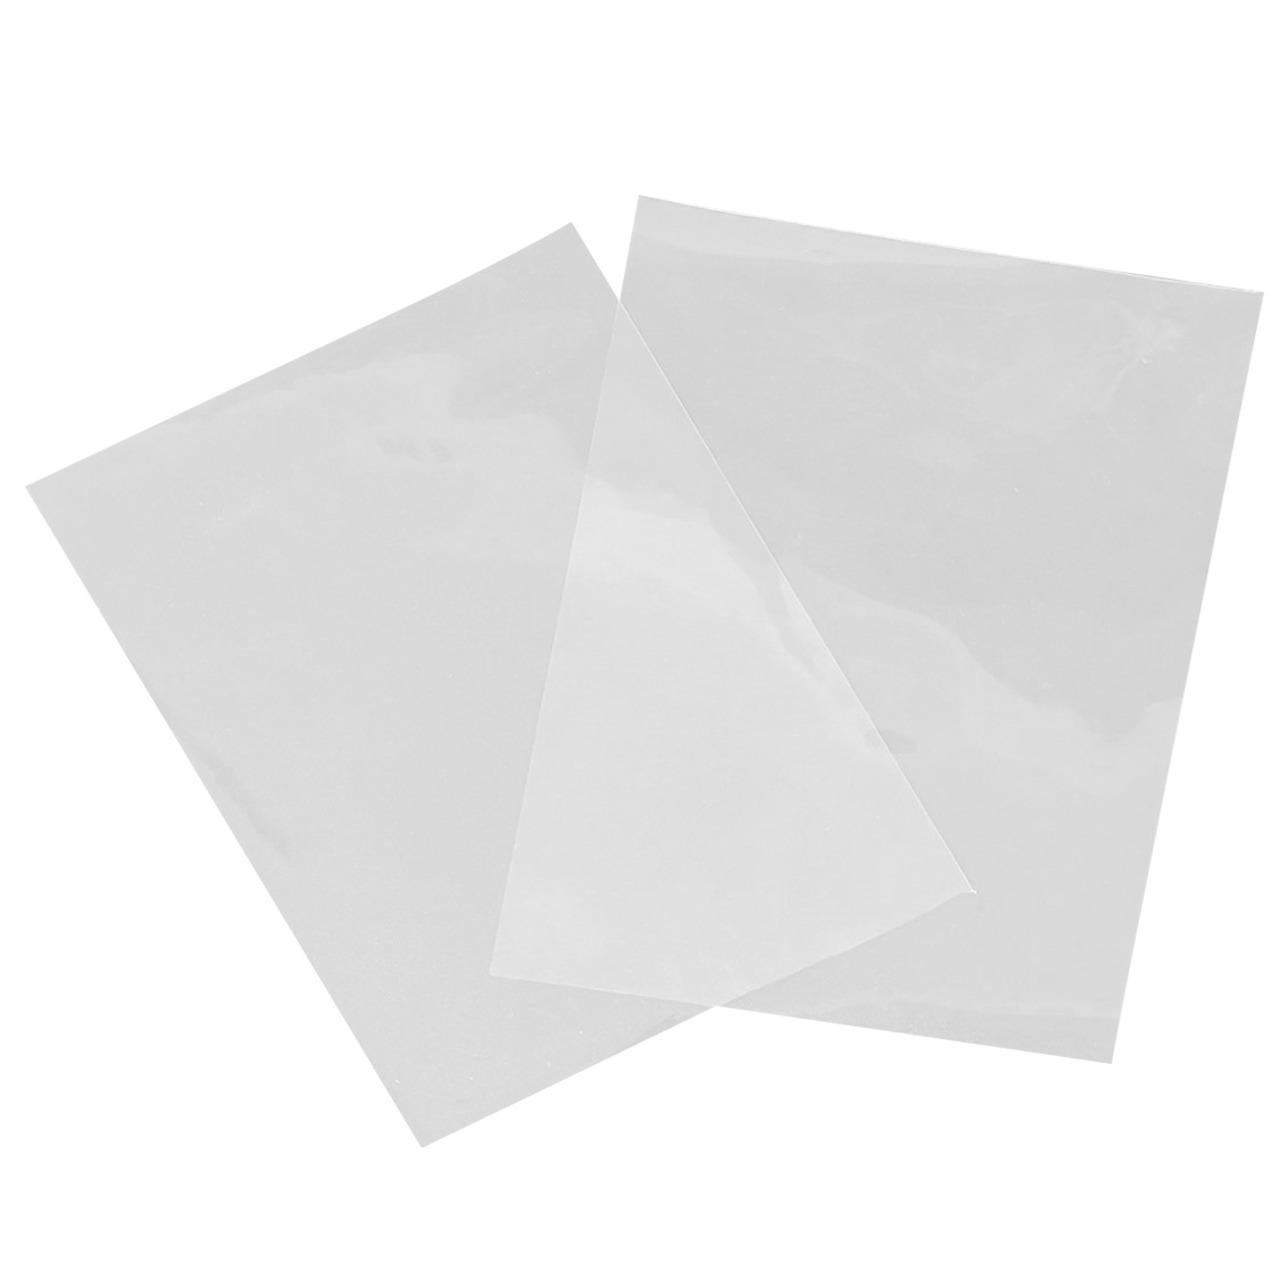 Monoprice Ersatz-/Zubehör-FEP-Folie für Mini-SLA/LCD-3D-Drucker MP Mini SLA- 2er-Pack